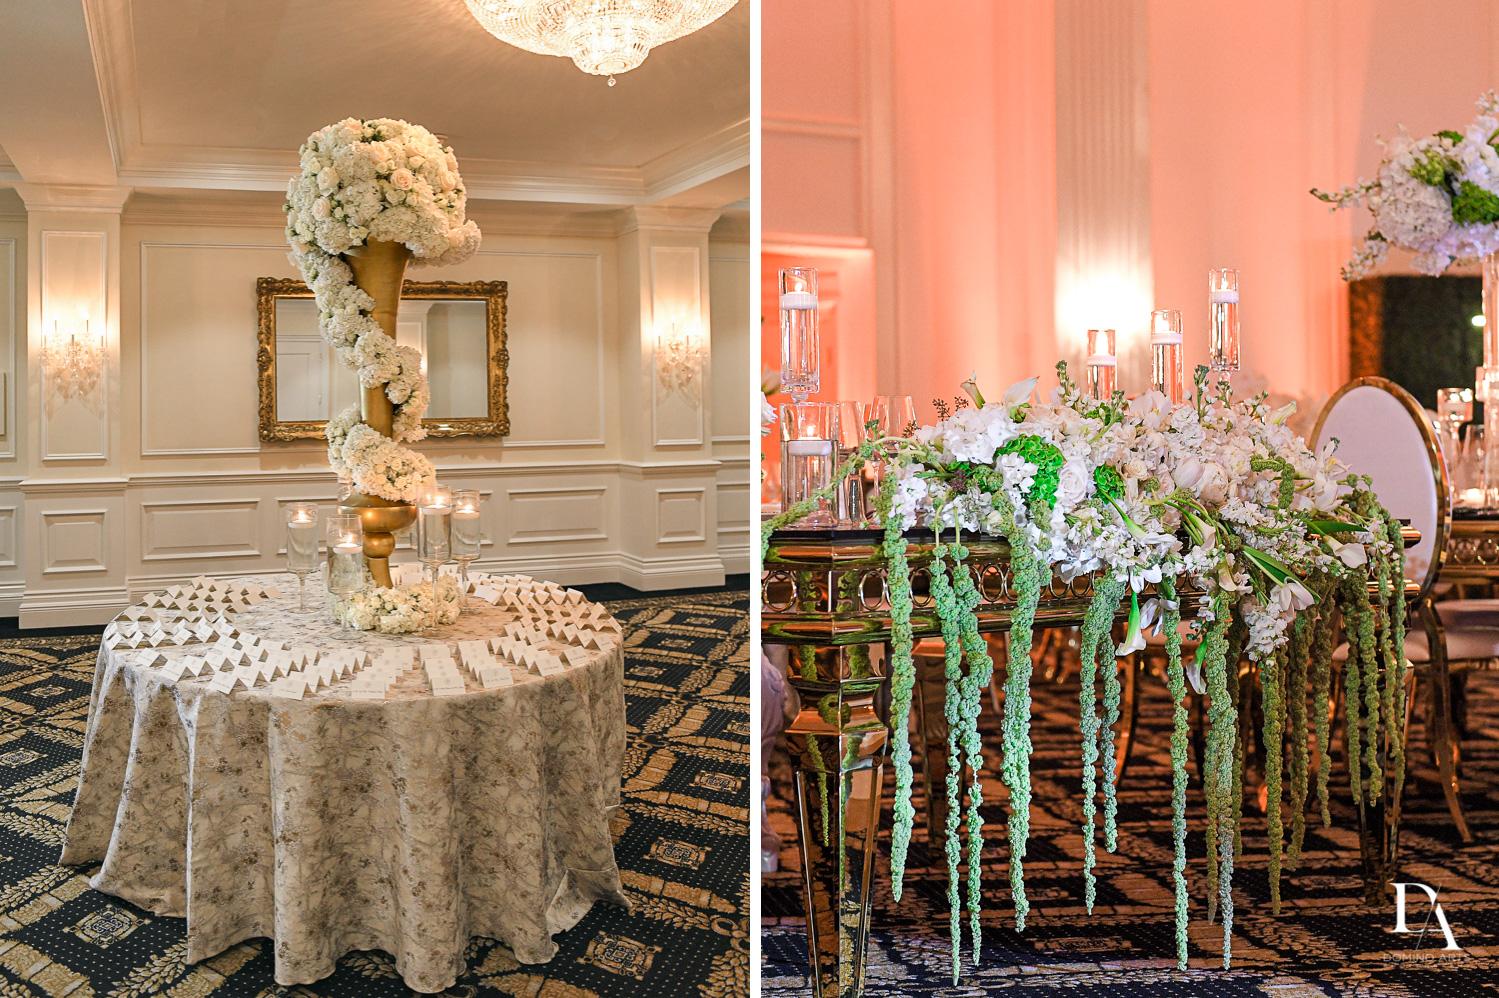 decor at Elegant Classy Wedding at Trump Doral by Domino Arts Photography